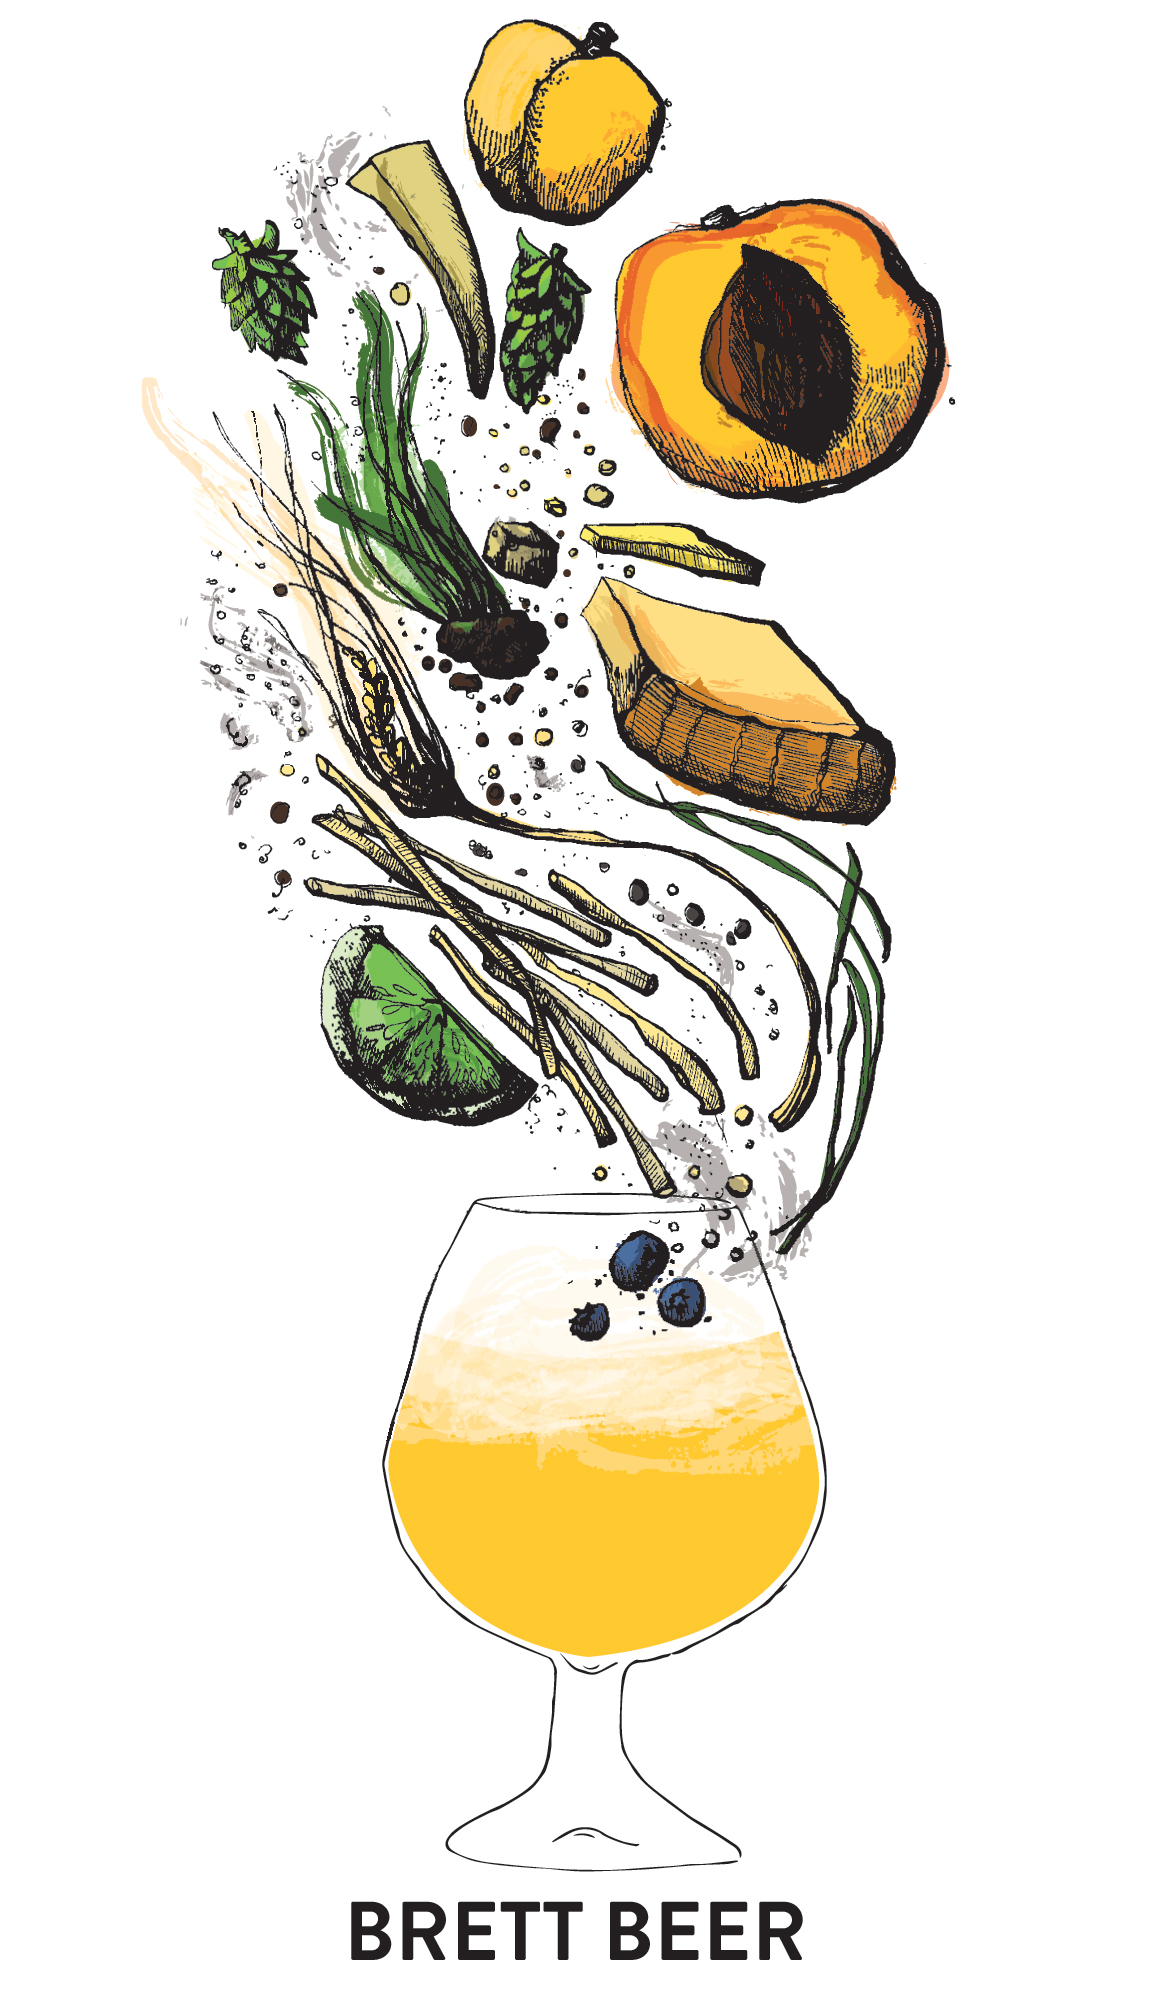 Brett beer flavor and aroma illustration